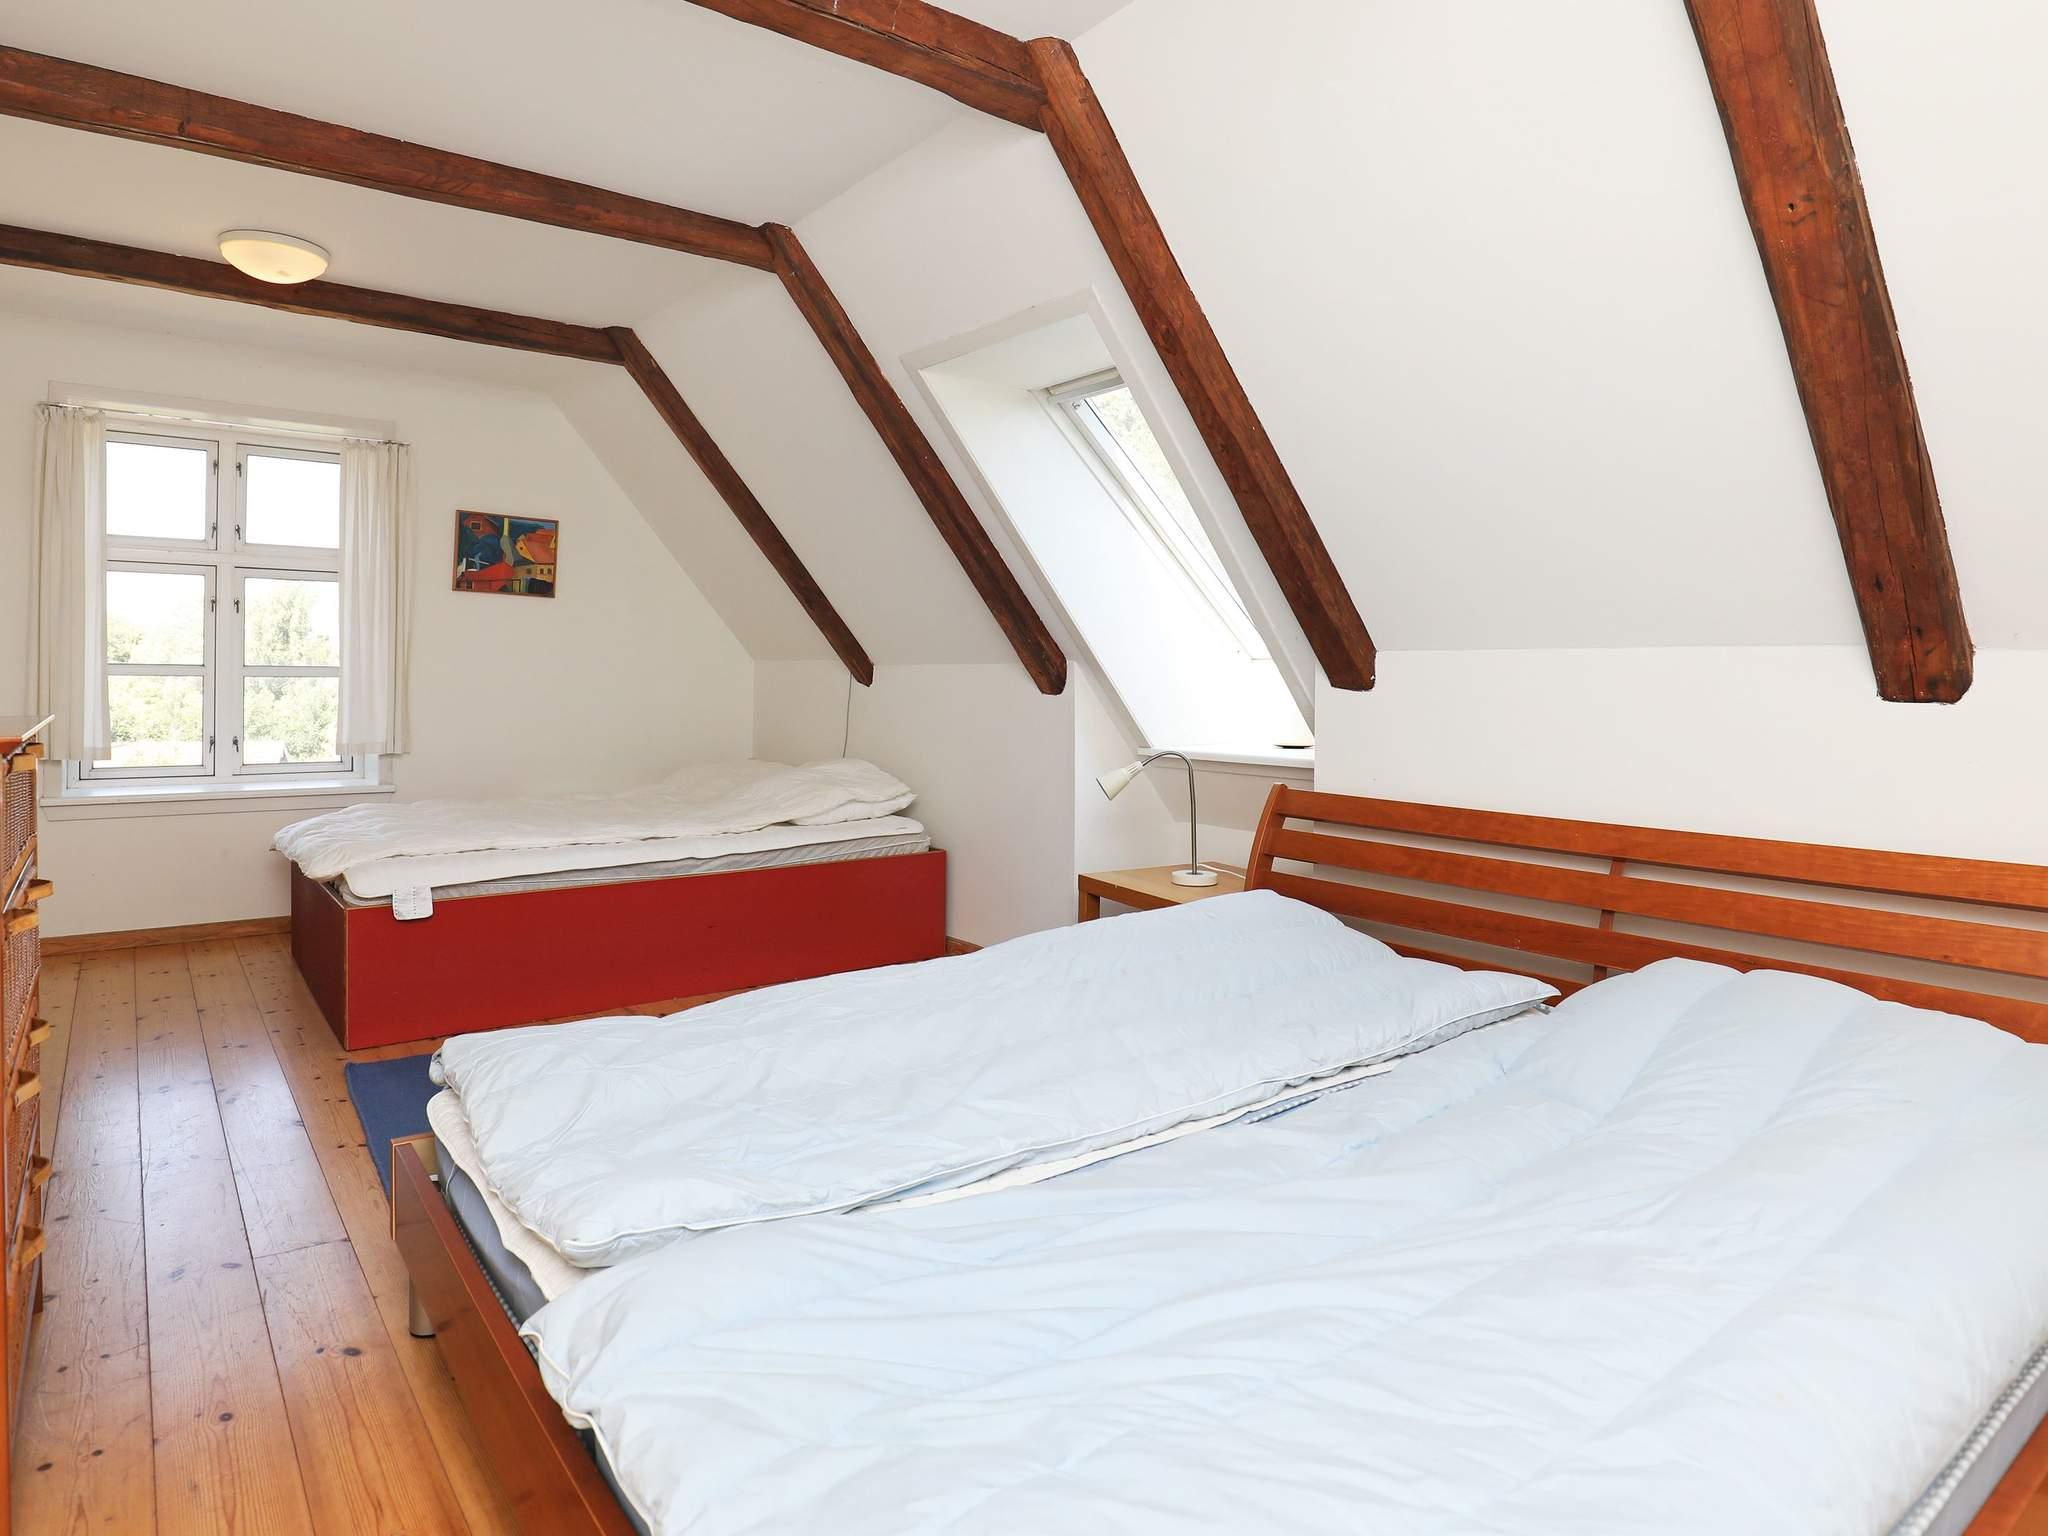 Ferienhaus Bukkemose (2453155), Humble, , Langeland, Dänemark, Bild 19